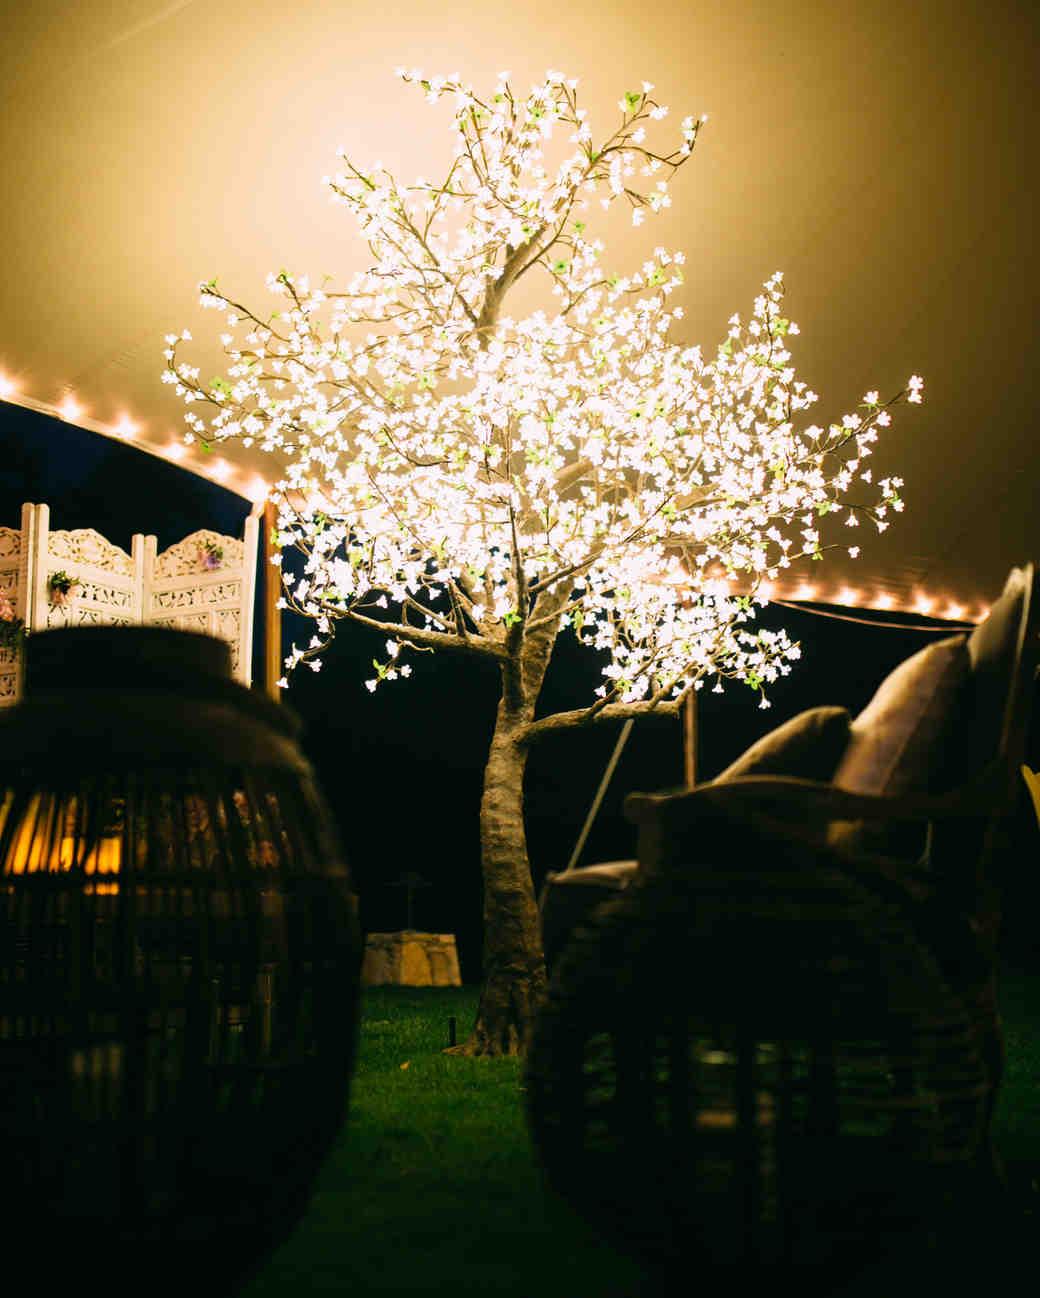 surprising-rentals-whim-event-rentals-led-tree-0615.jpg